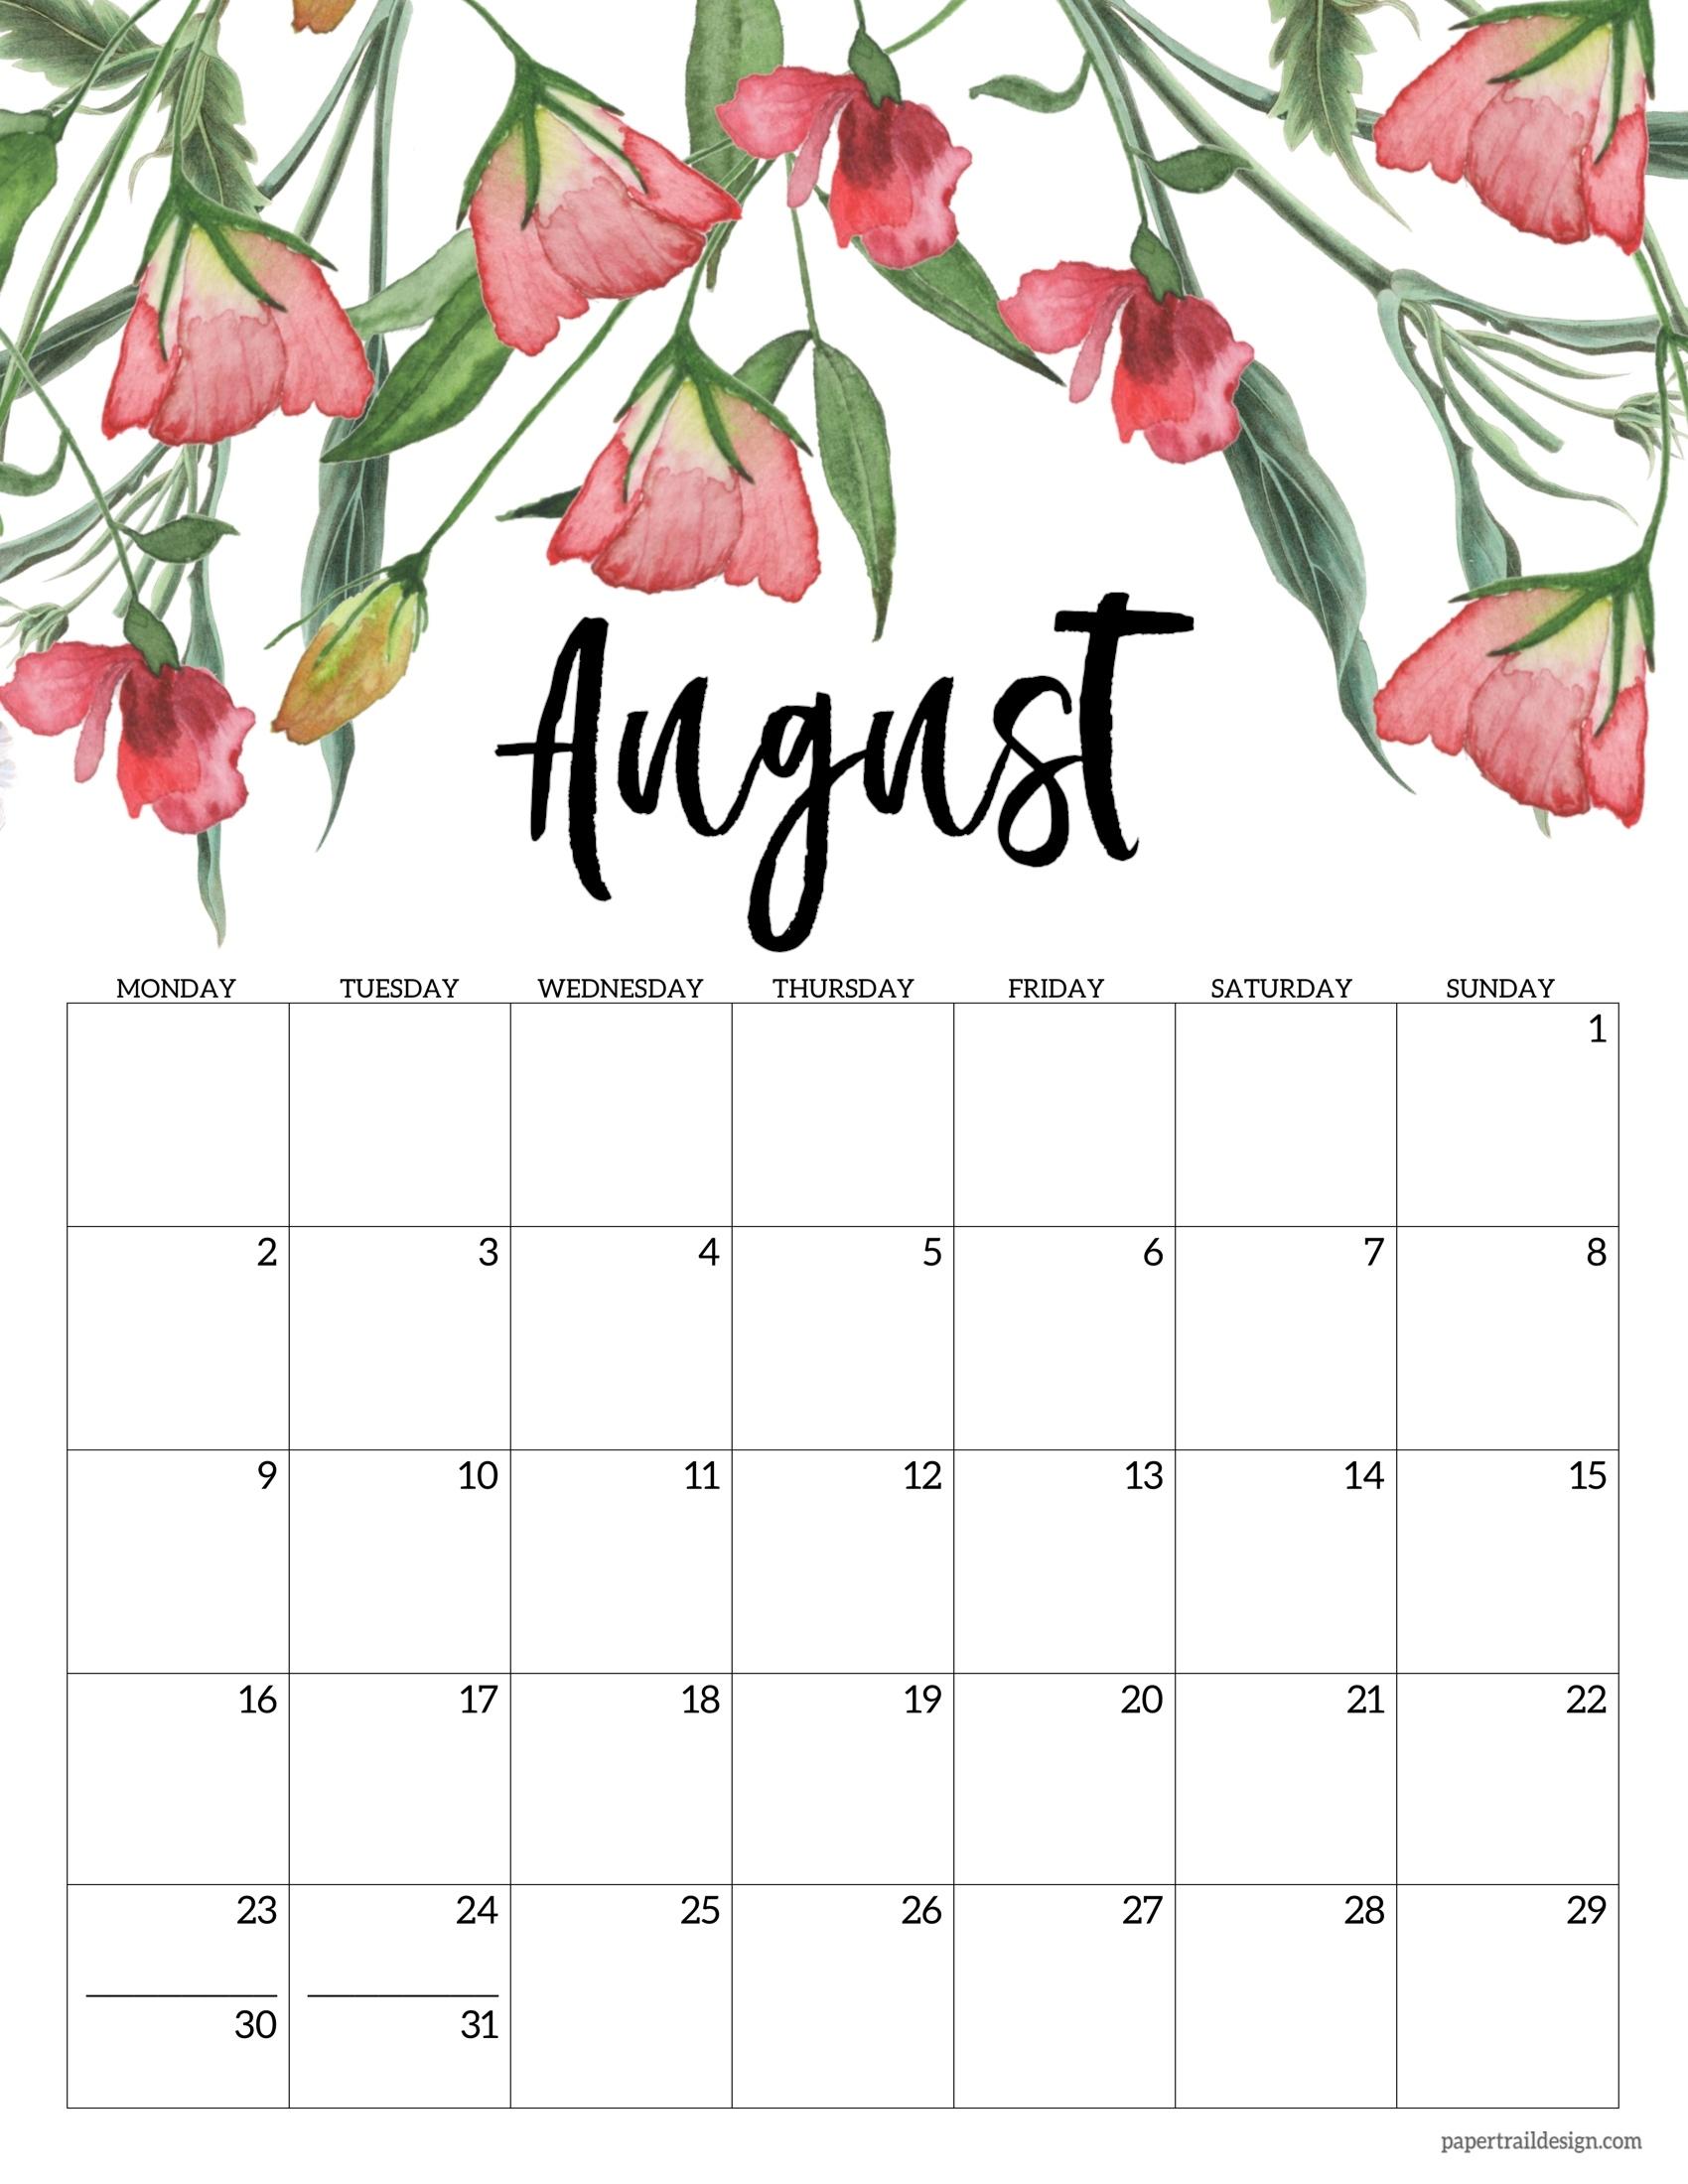 Free Printable 2021 Floral Calendar - Monday Start   Paper Trail Design Print April May June 2021 Calendar